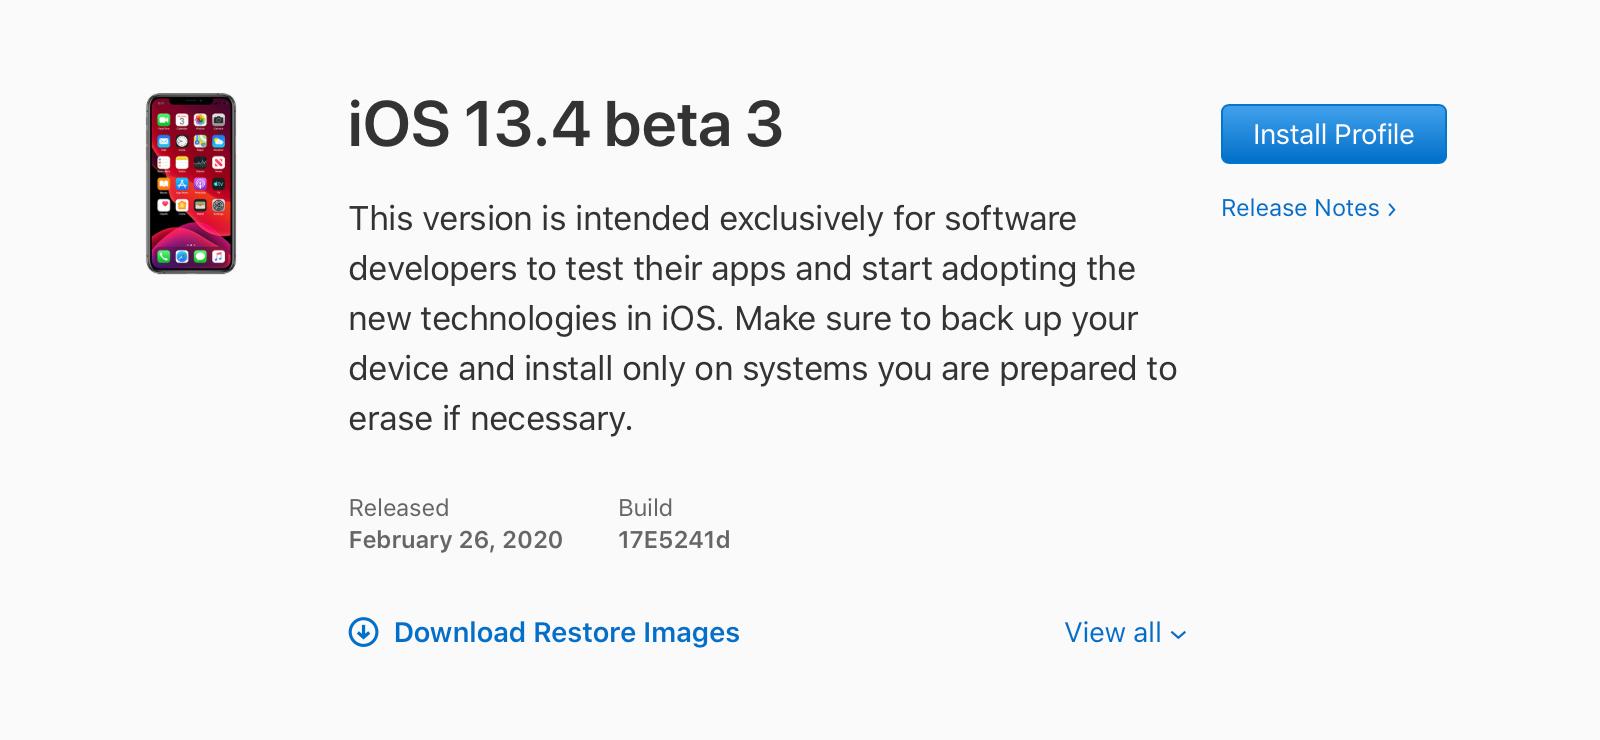 iOS 13.4 beta 3, iPadOS 13.4 beta 3, tvOS 13.4 beta 3, y watchOS 6.2 beta 3